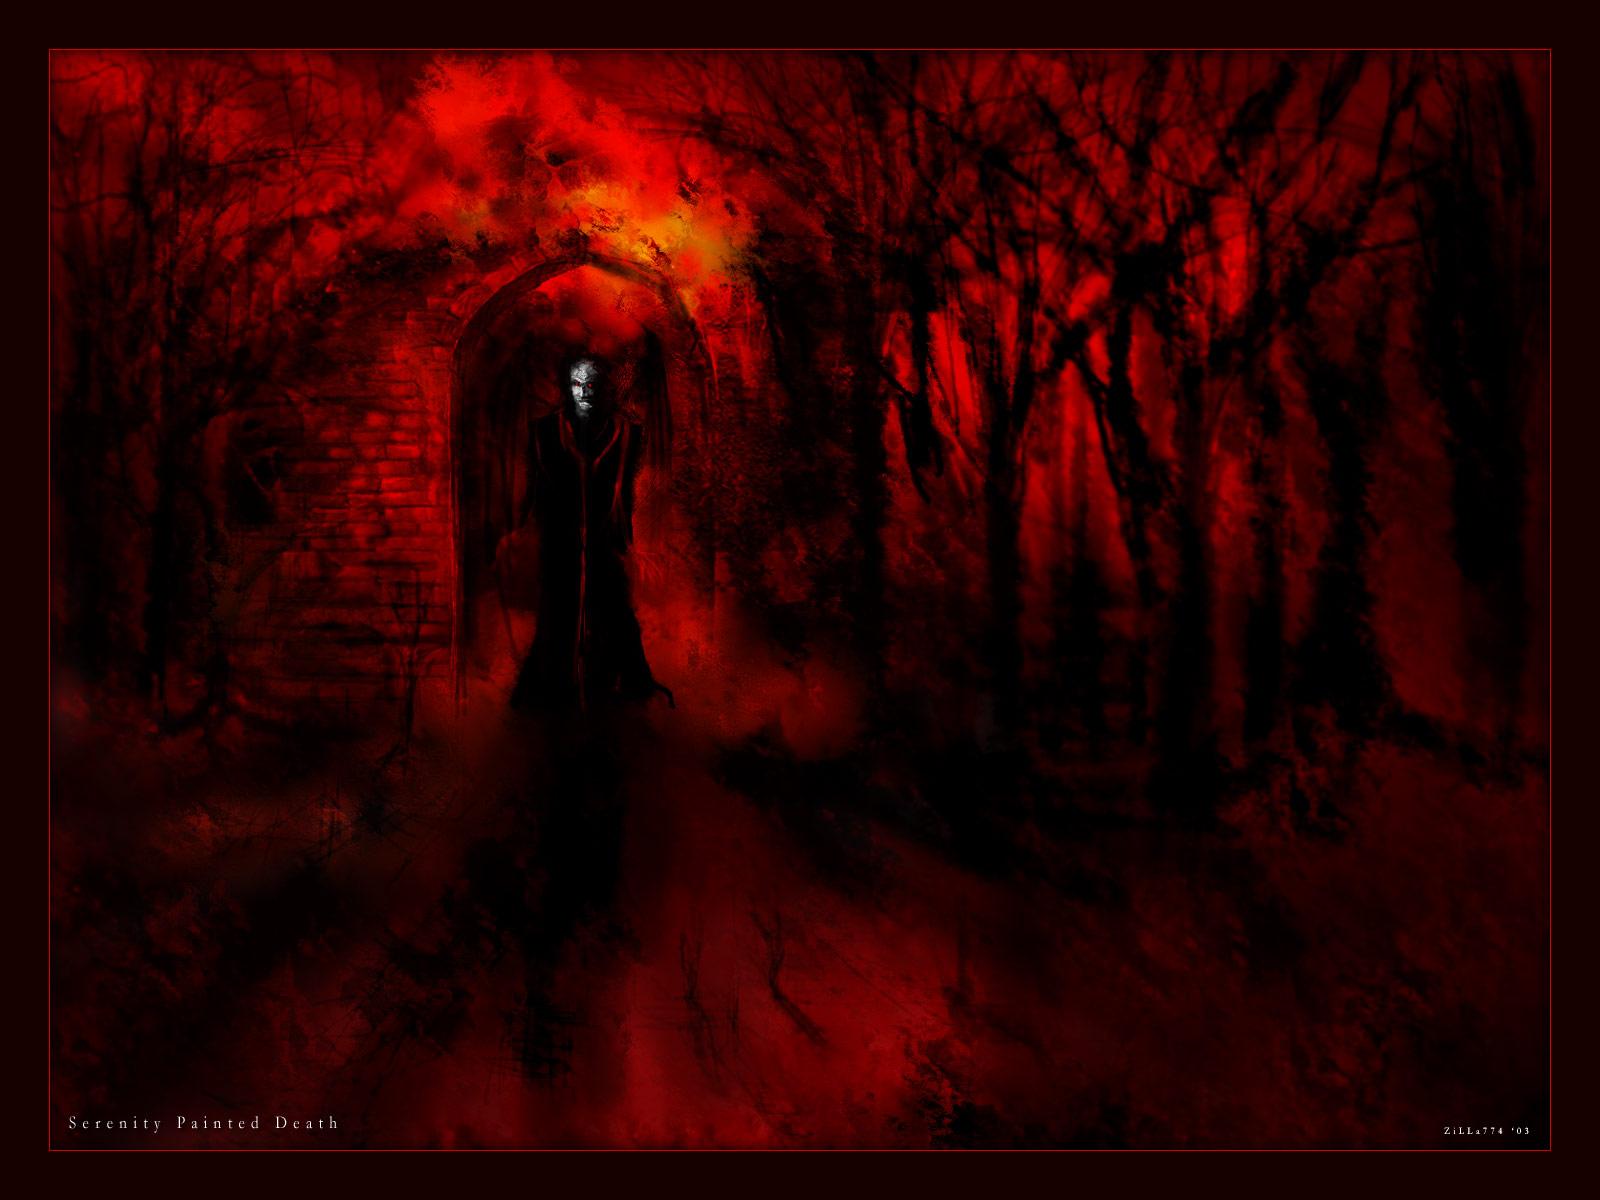 scary vampire wallpaper - photo #1